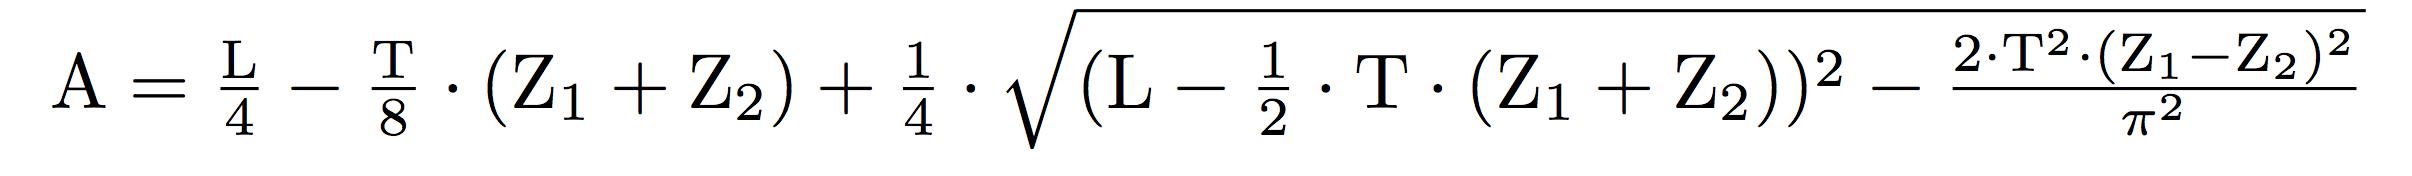 Formel zur Berechnung des Achsabstands